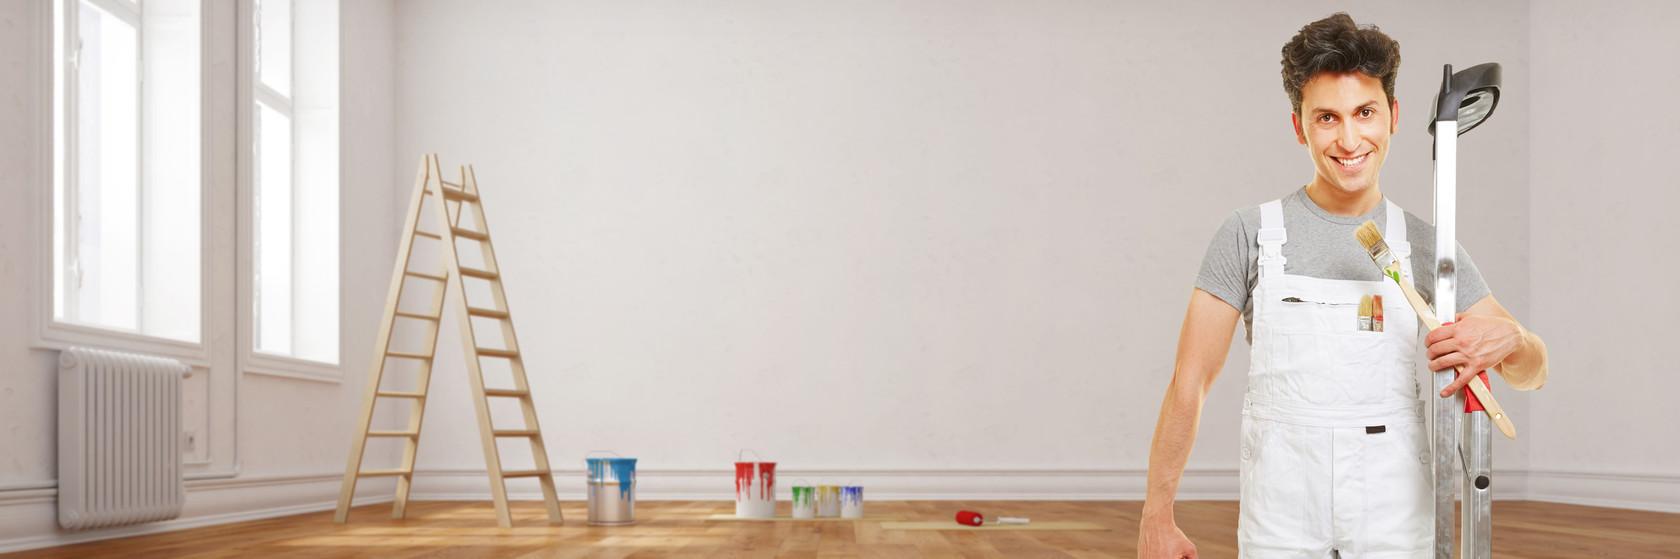 malerbetrieb michael beutel gmbh maler meisterbetrieb in esslingen und umgebung. Black Bedroom Furniture Sets. Home Design Ideas